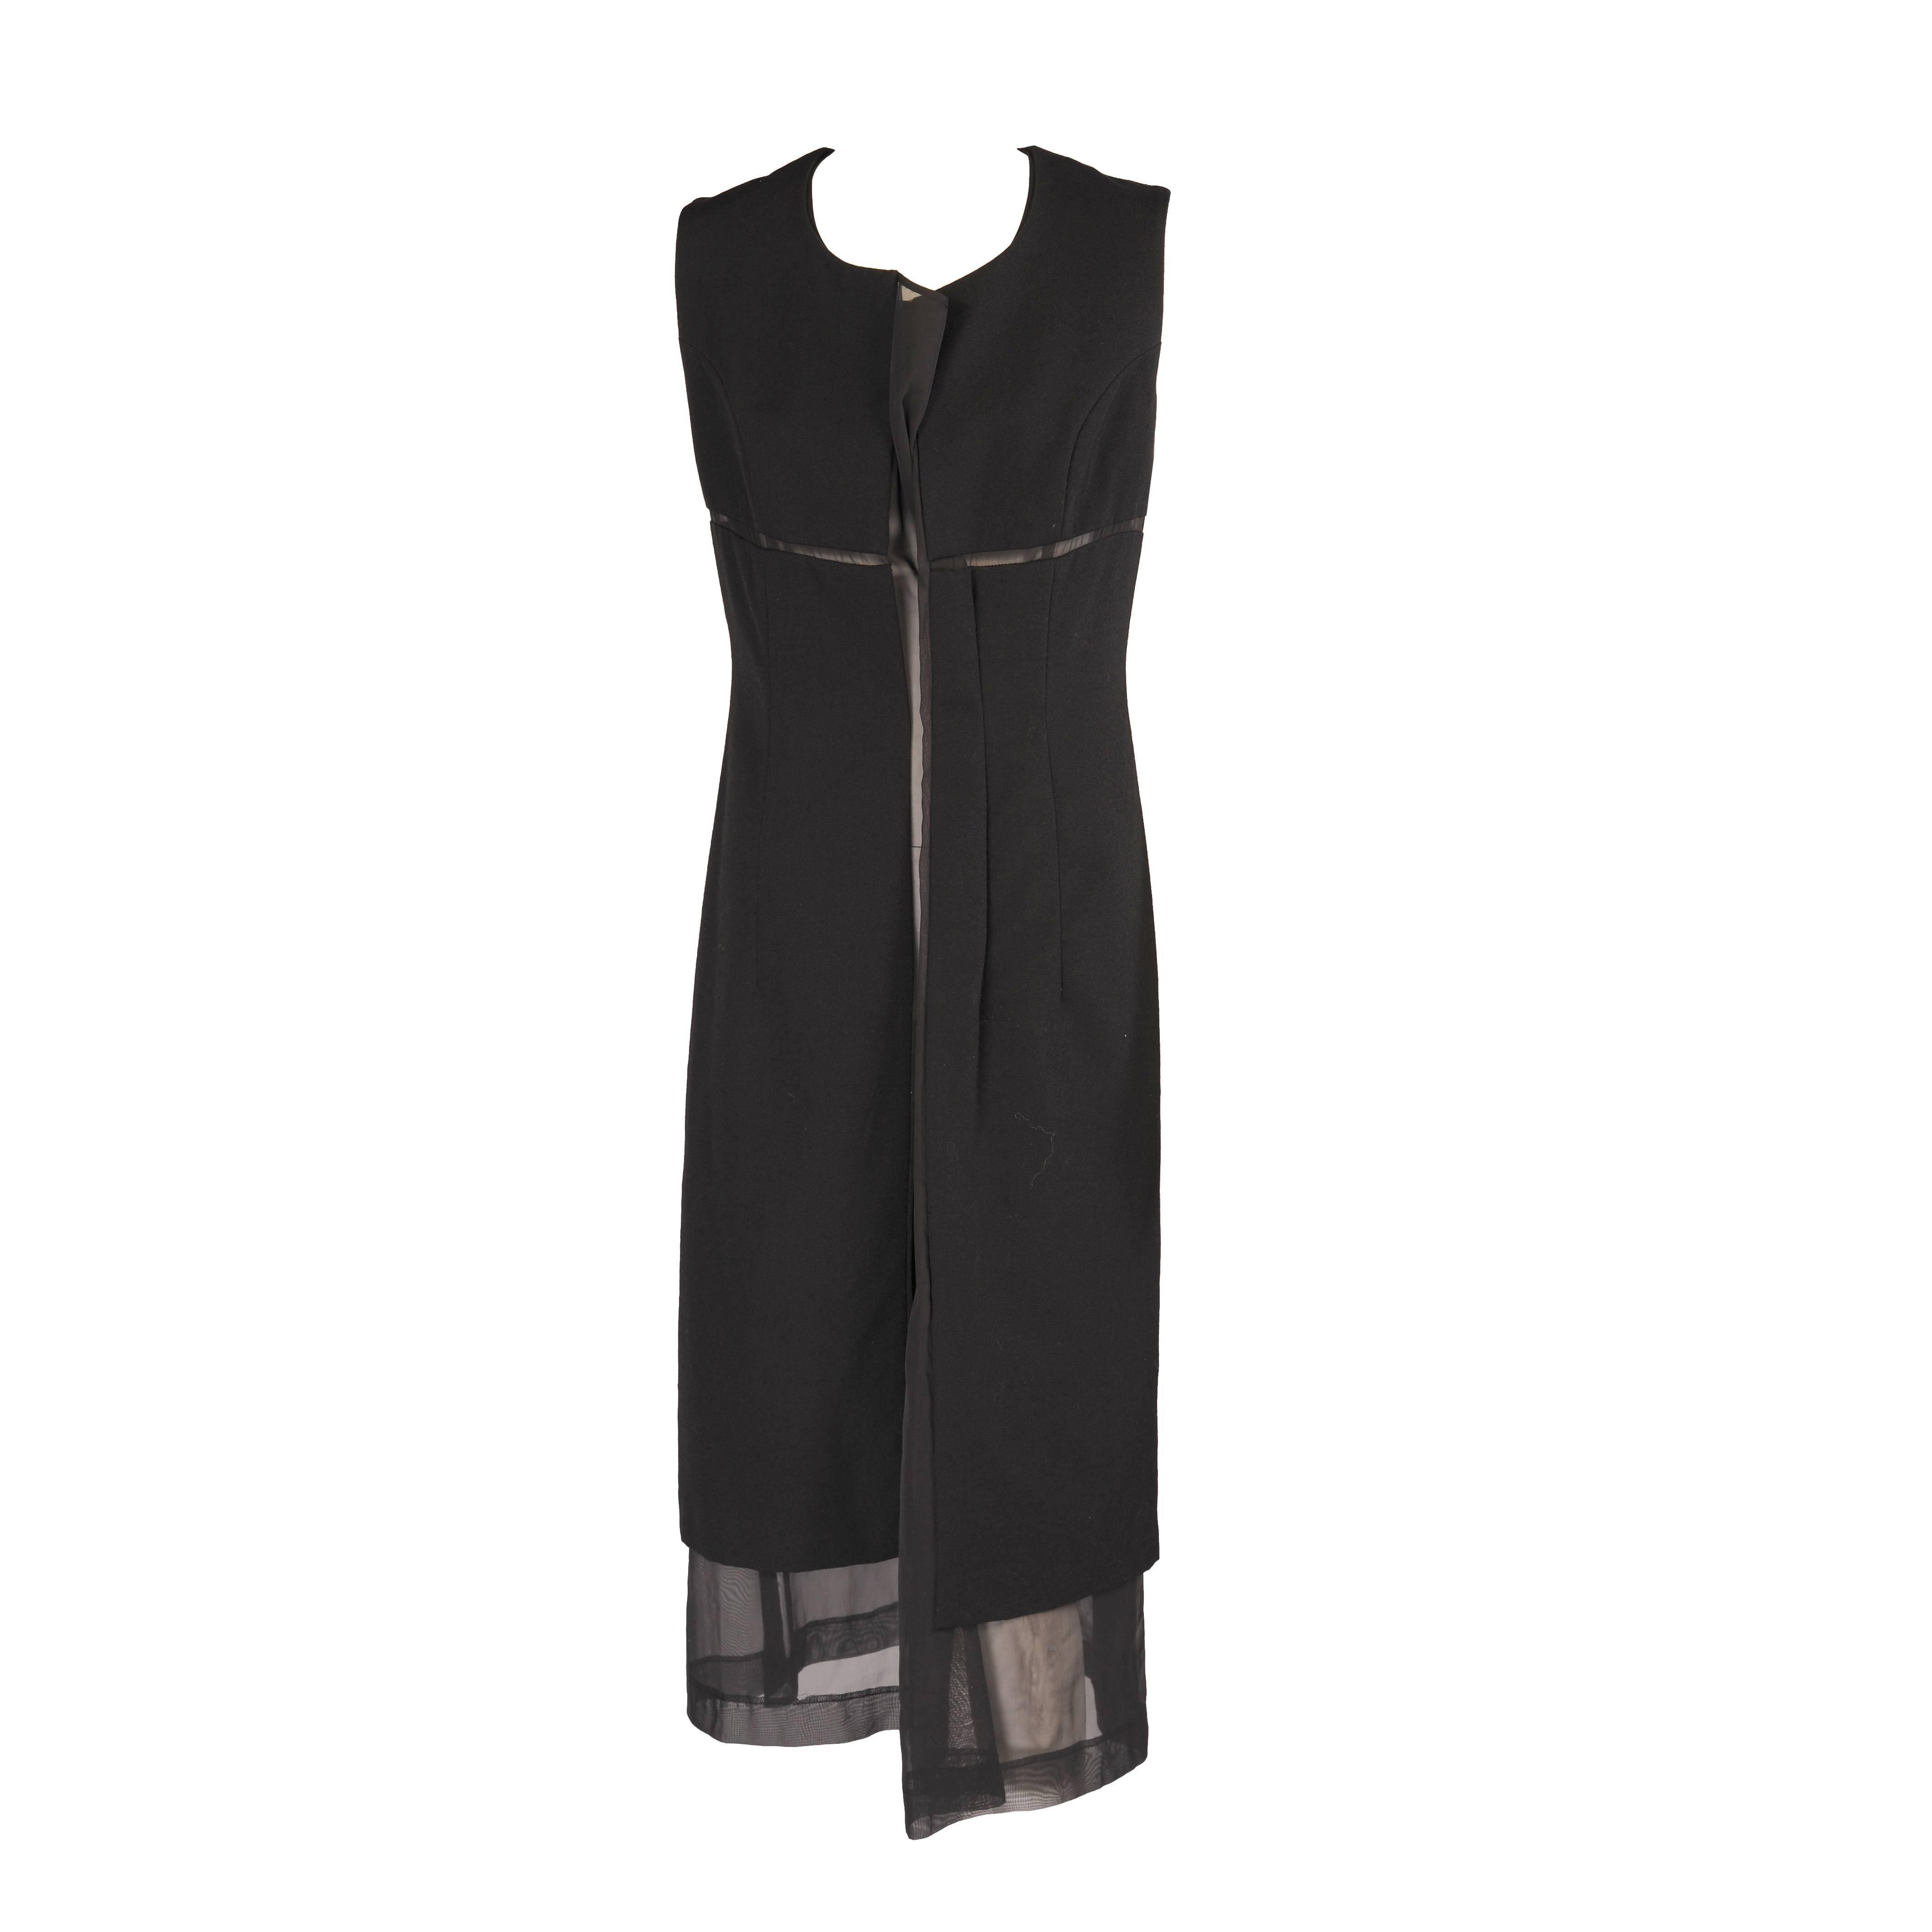 335107546153 Comme des Garcons Black Dress with Sheer Center Panel For Sale at 1stdibs